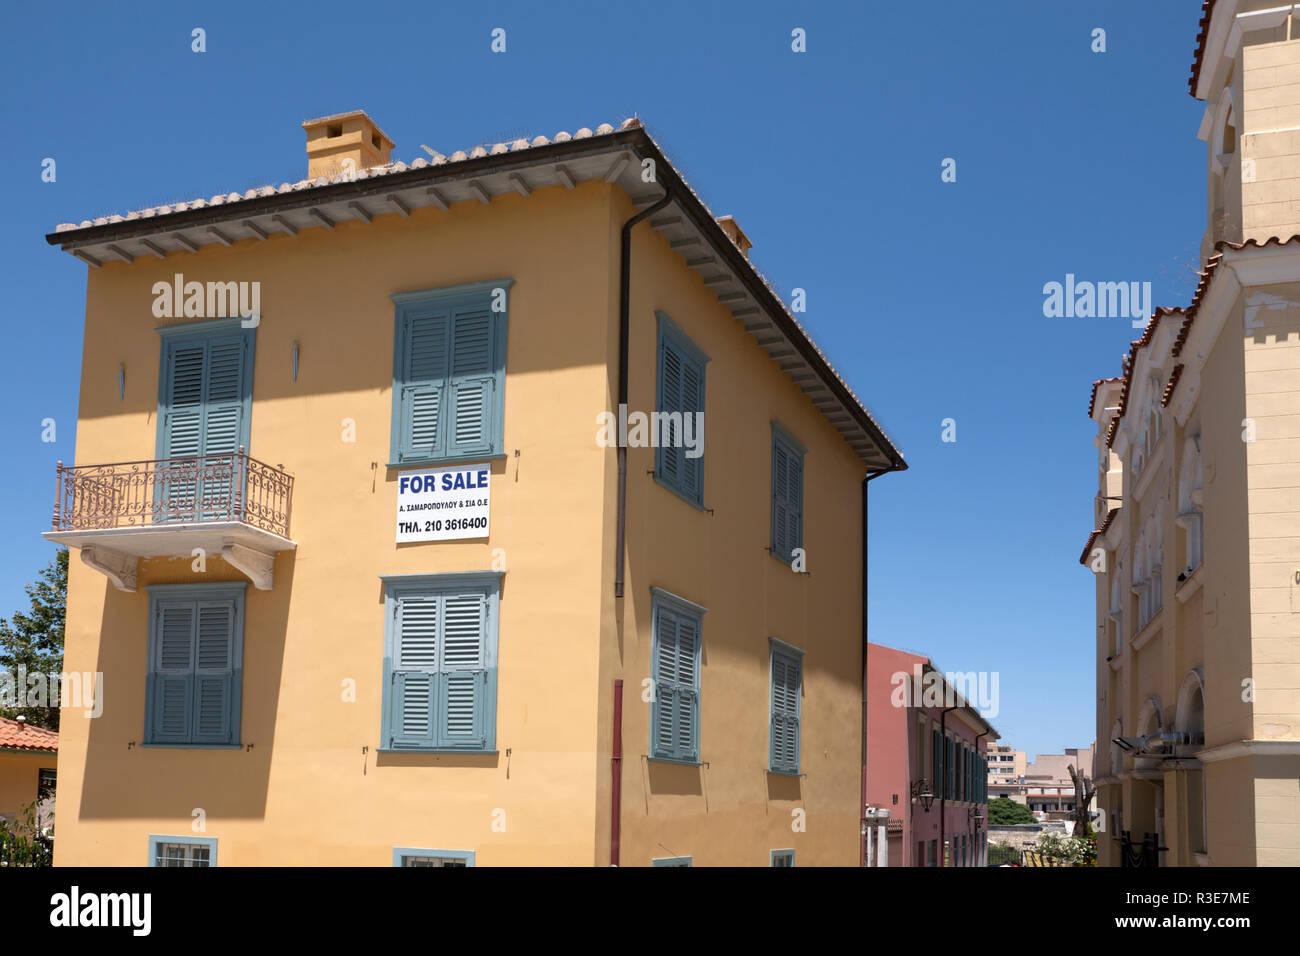 house for sale monastiraki athens greece - Stock Image